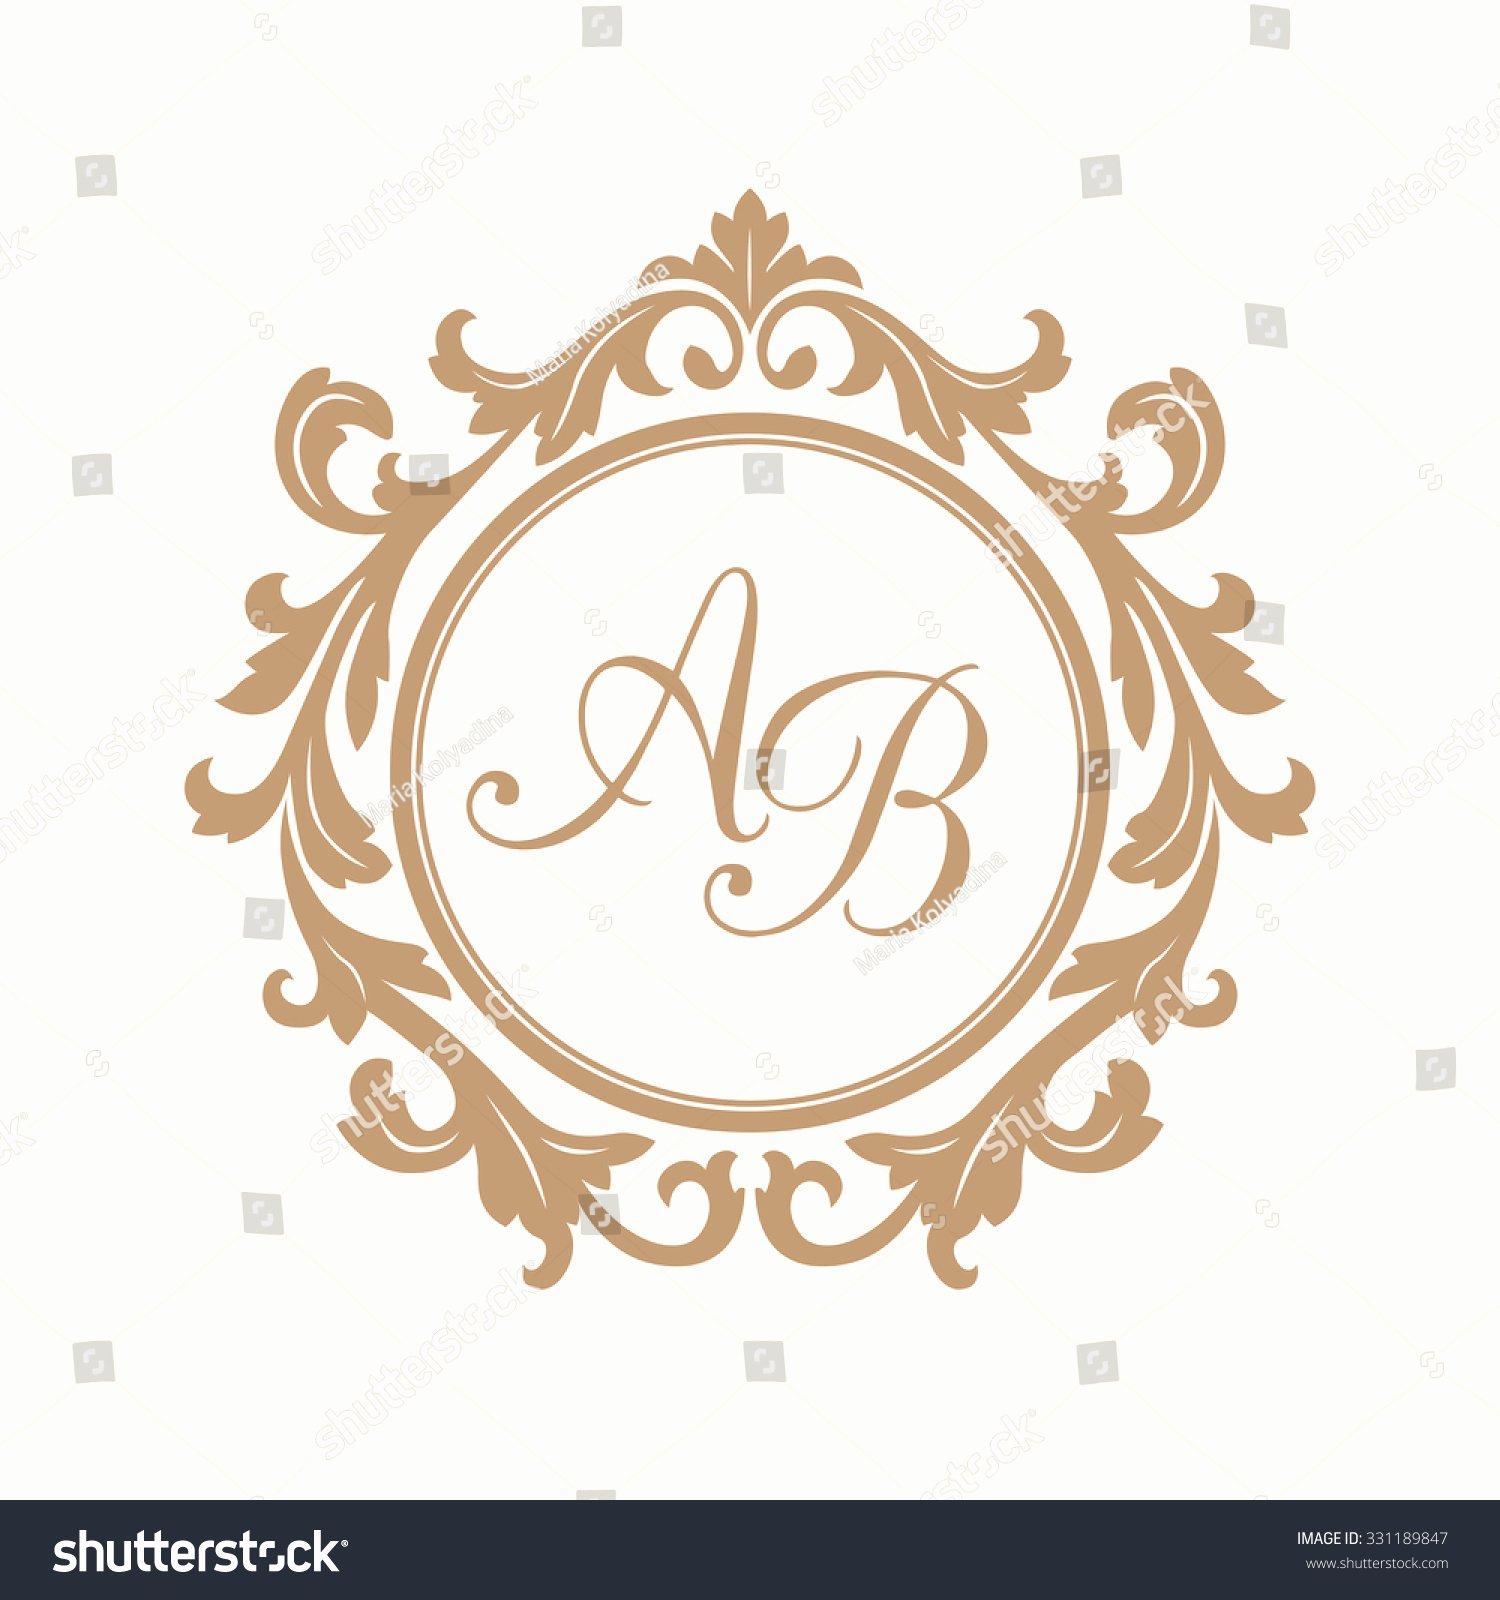 Free Wedding Monogram Template Elegant Elegant Floral Monogram Design Template E Lager Vektor